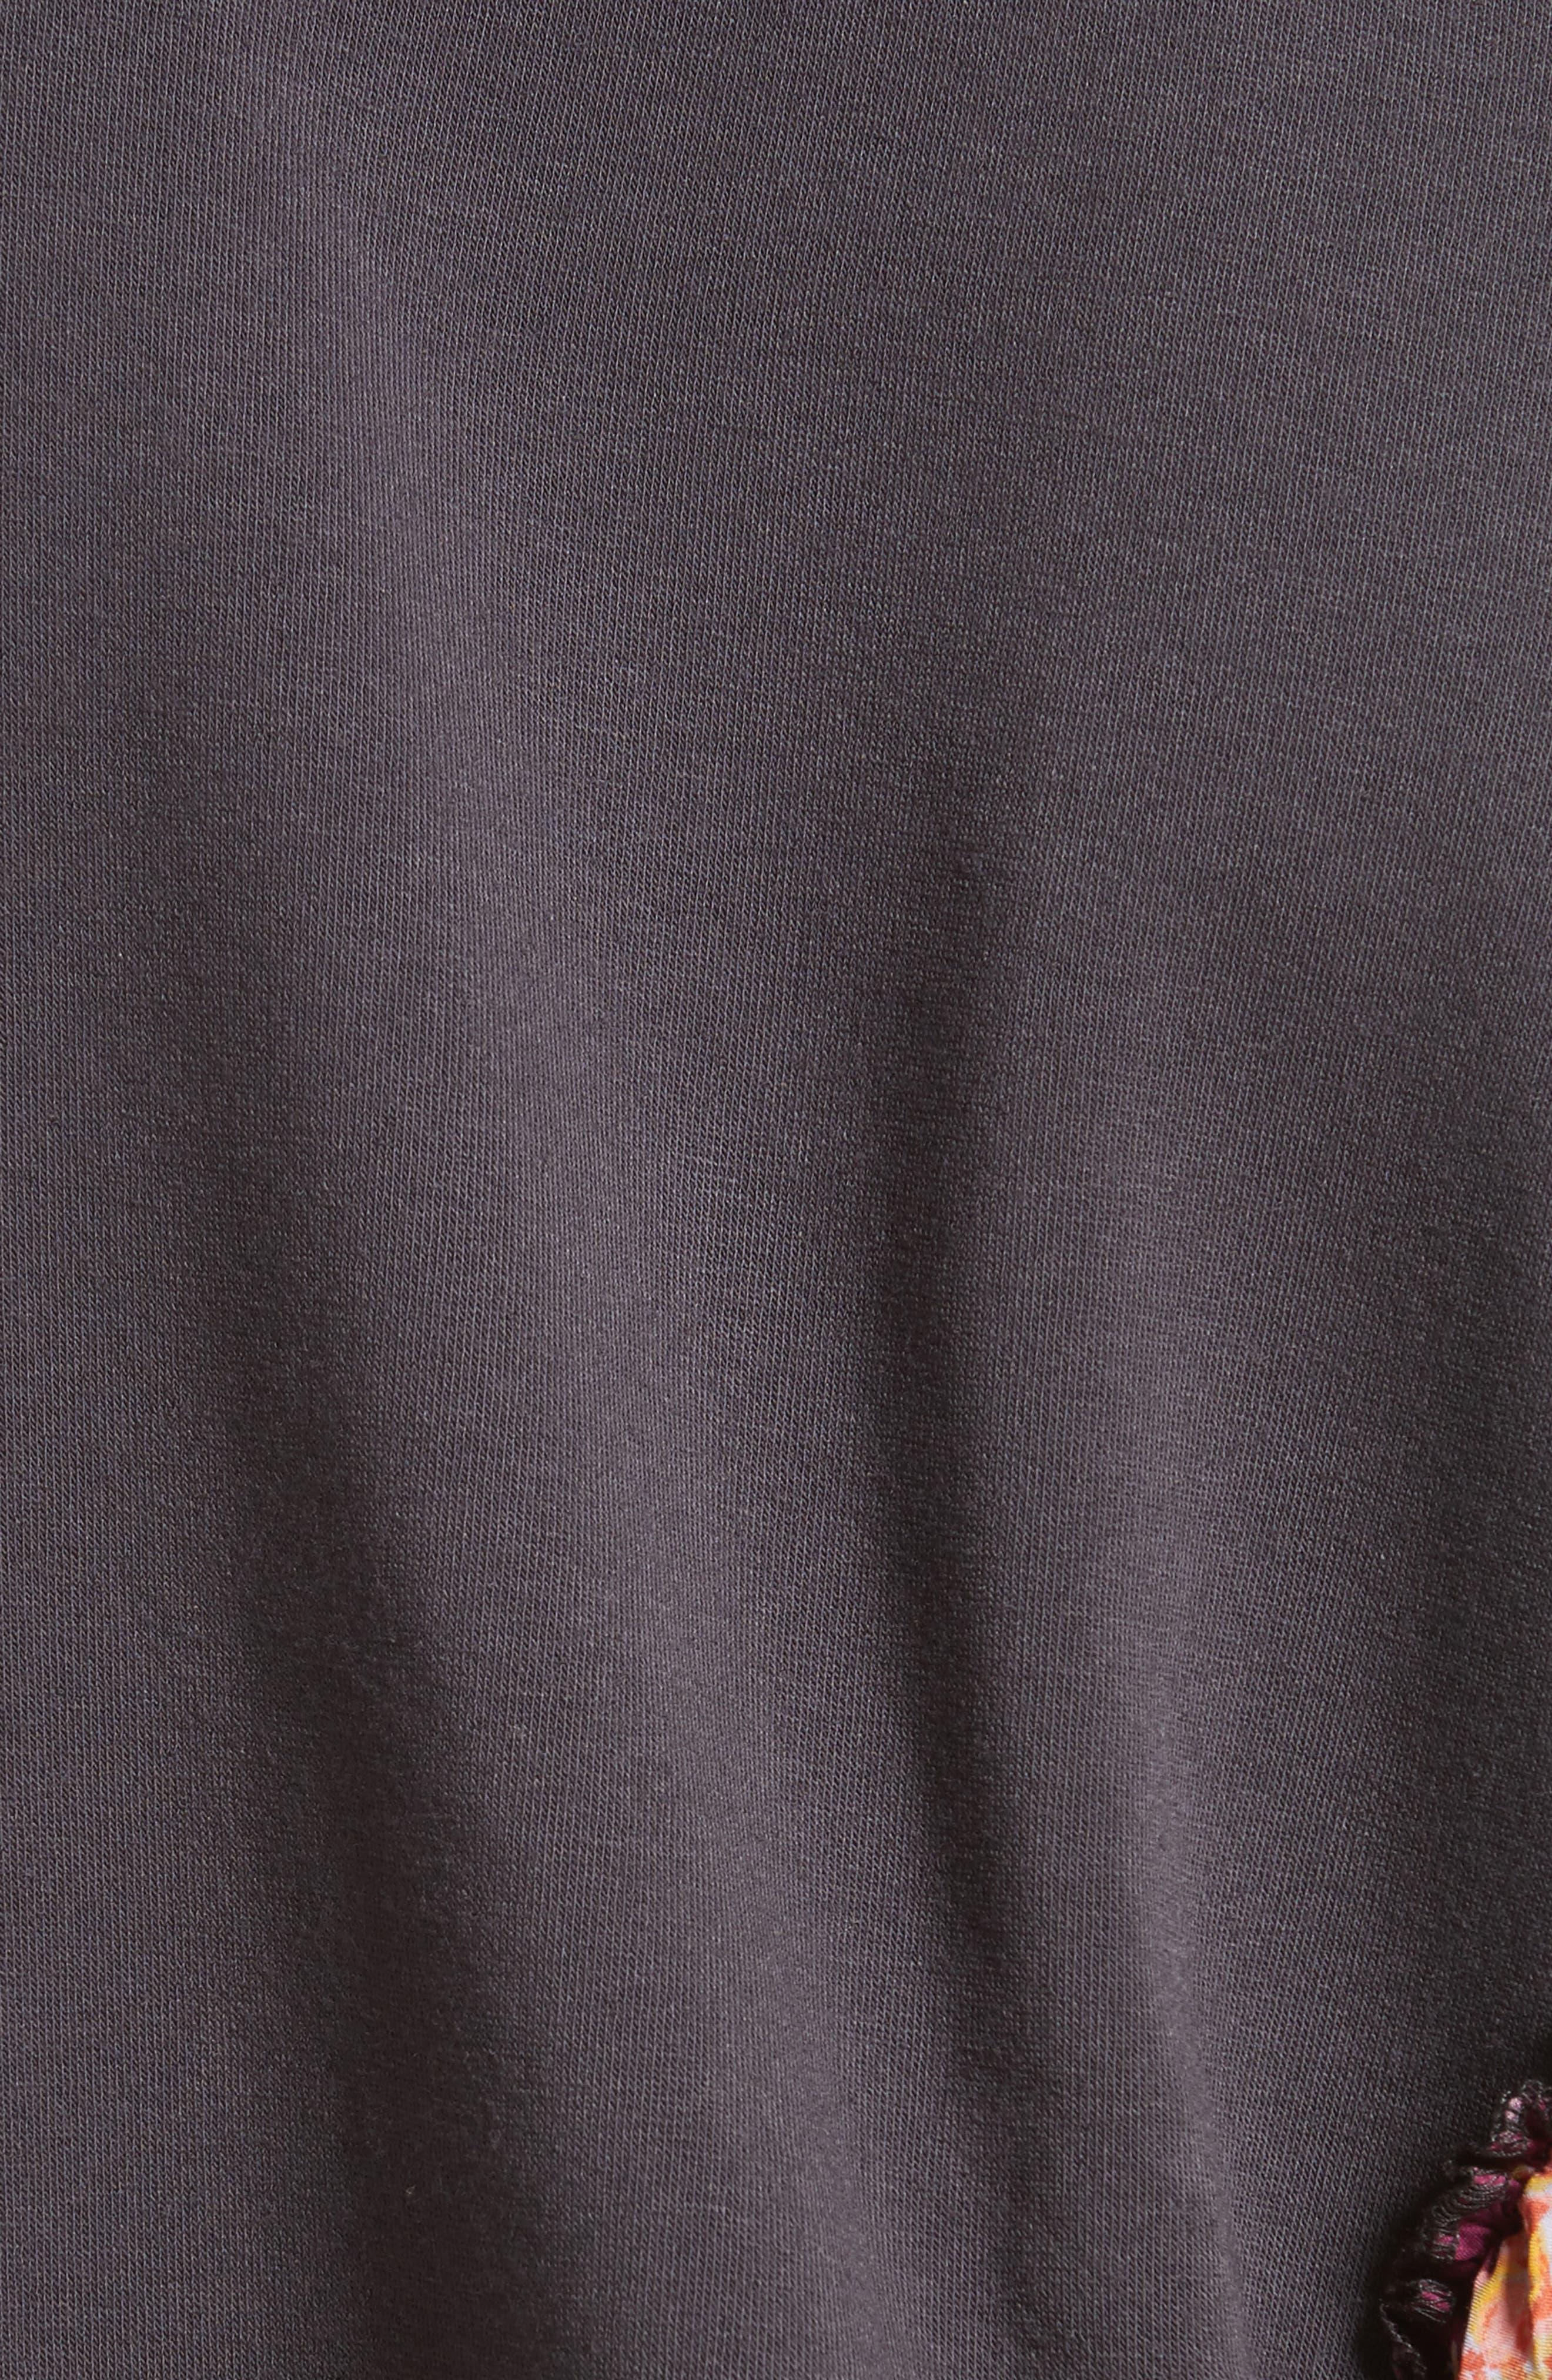 She's Just Cute Sweatshirt,                             Alternate thumbnail 4, color,                             Black